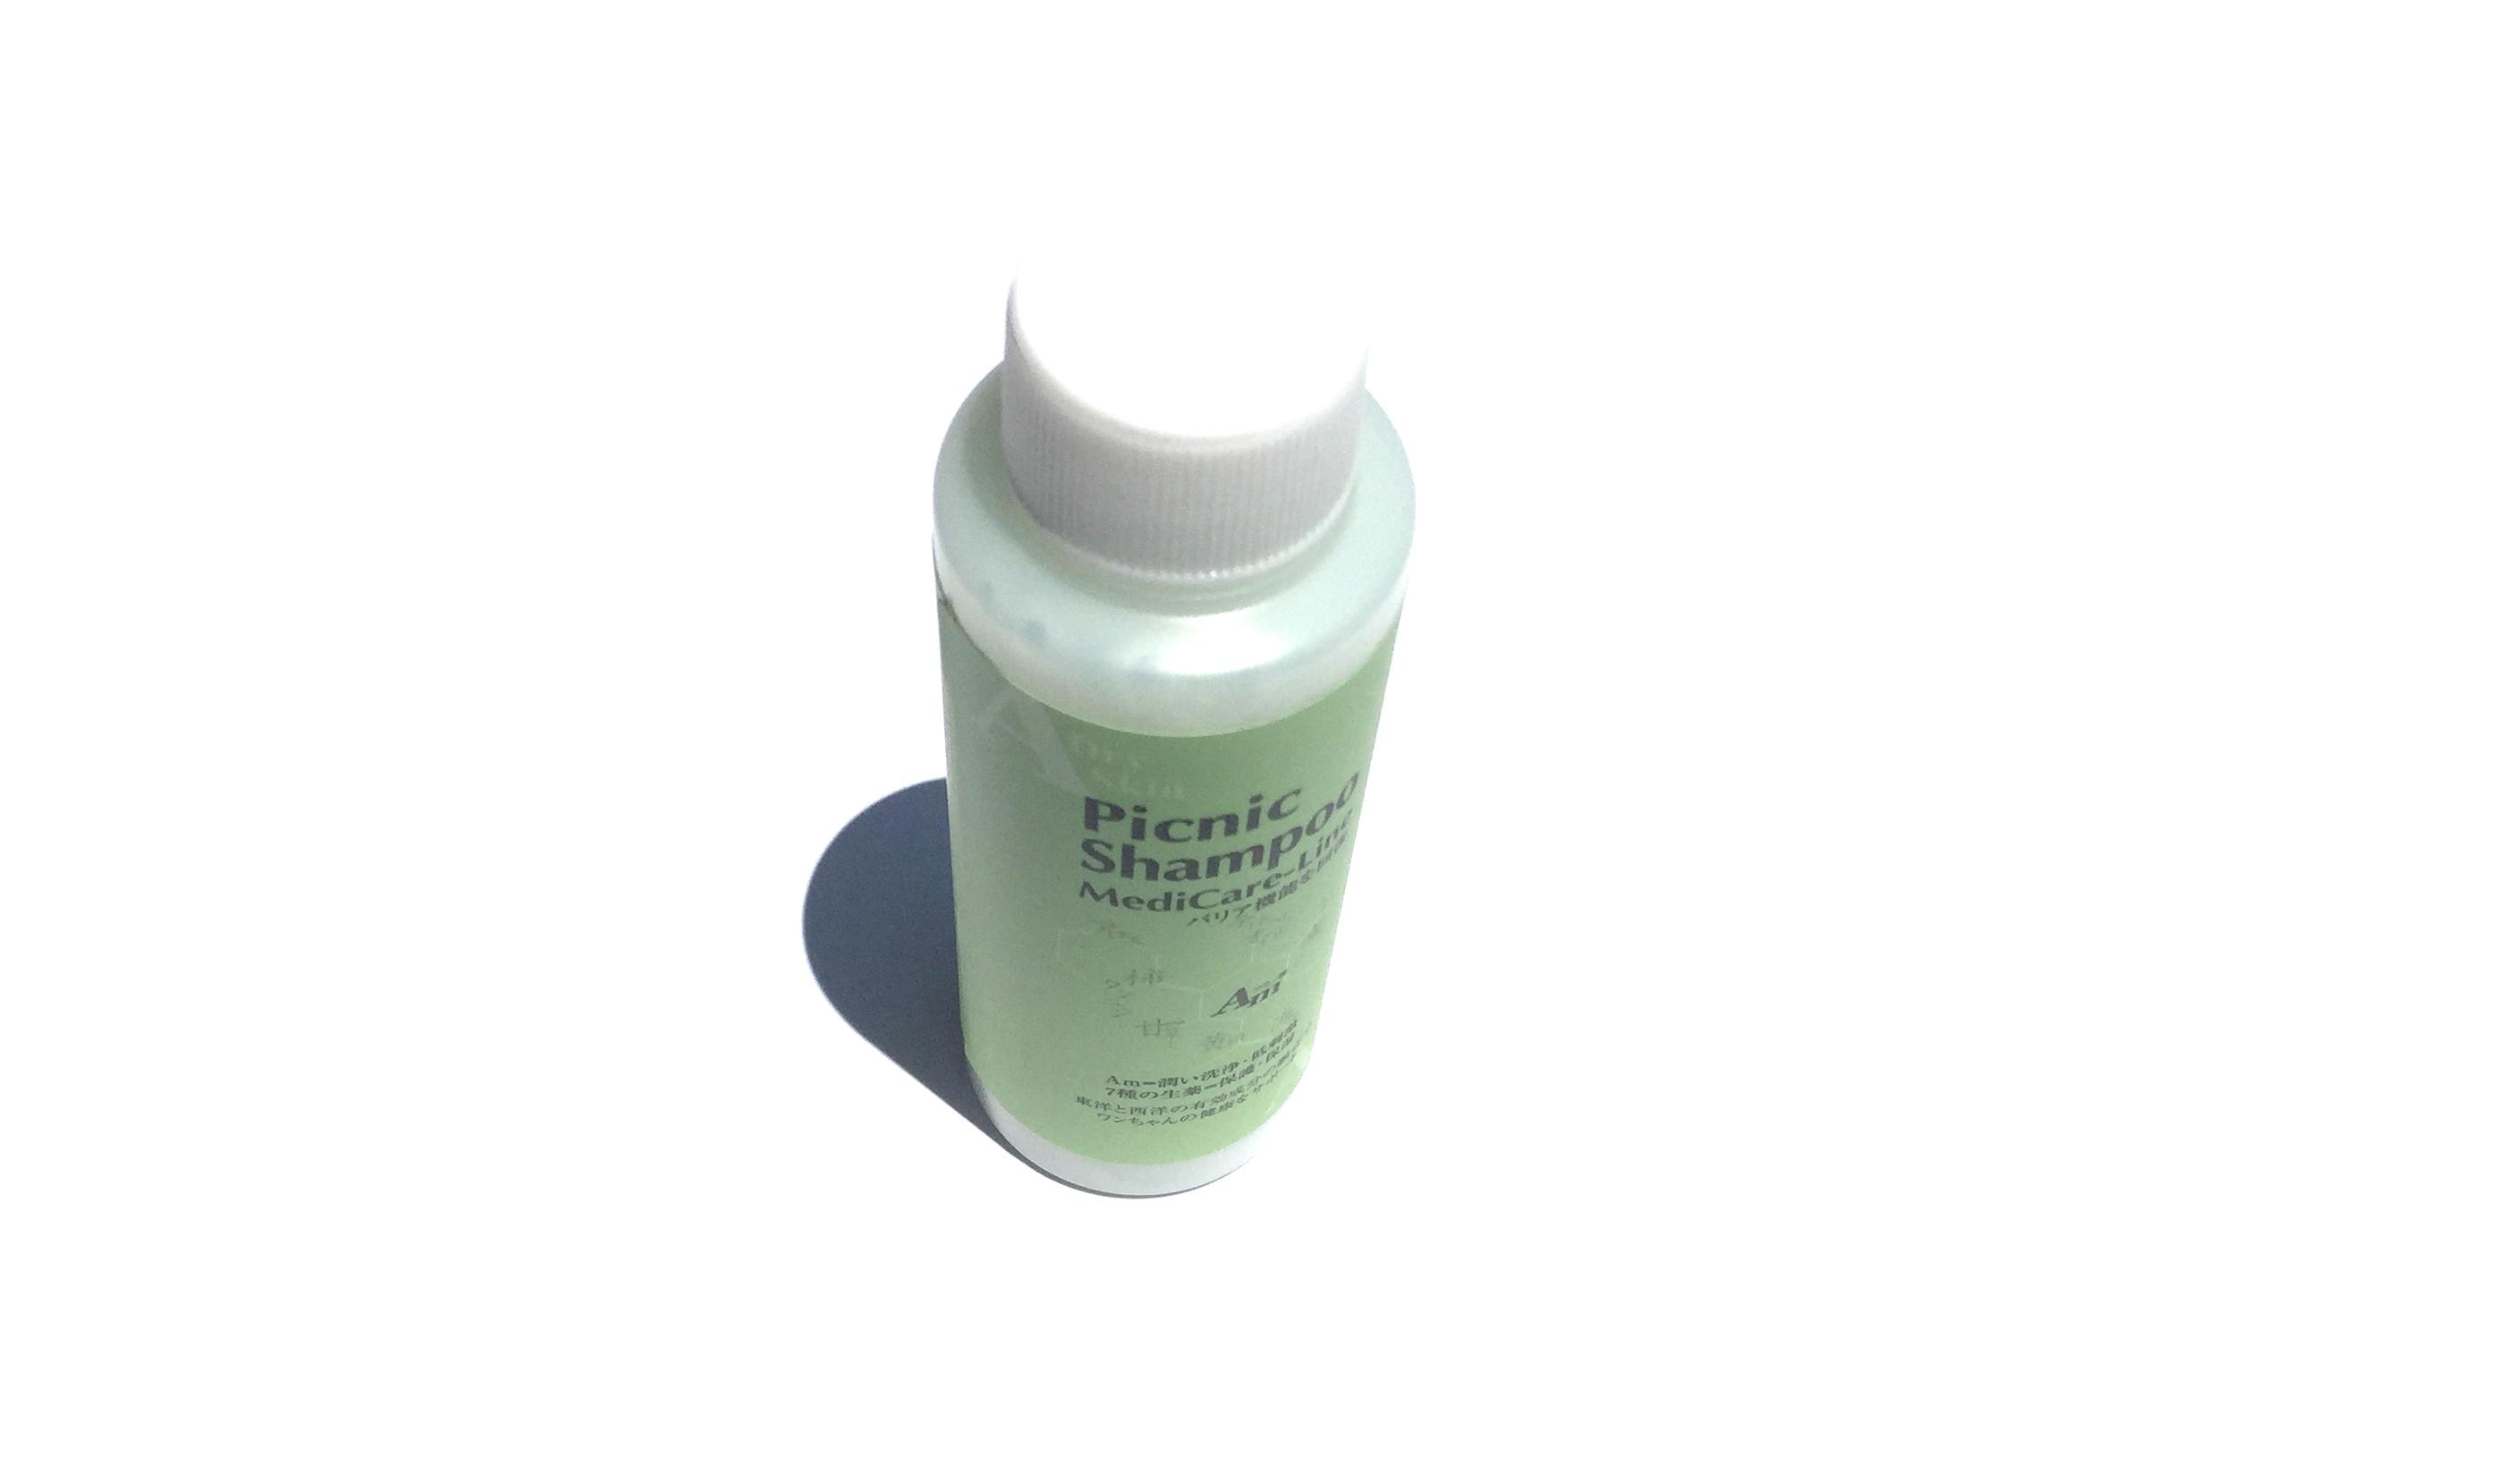 Picnic Shampoo  A ピクニック シャンプー エー ドライスキン_d0217958_1145284.jpg